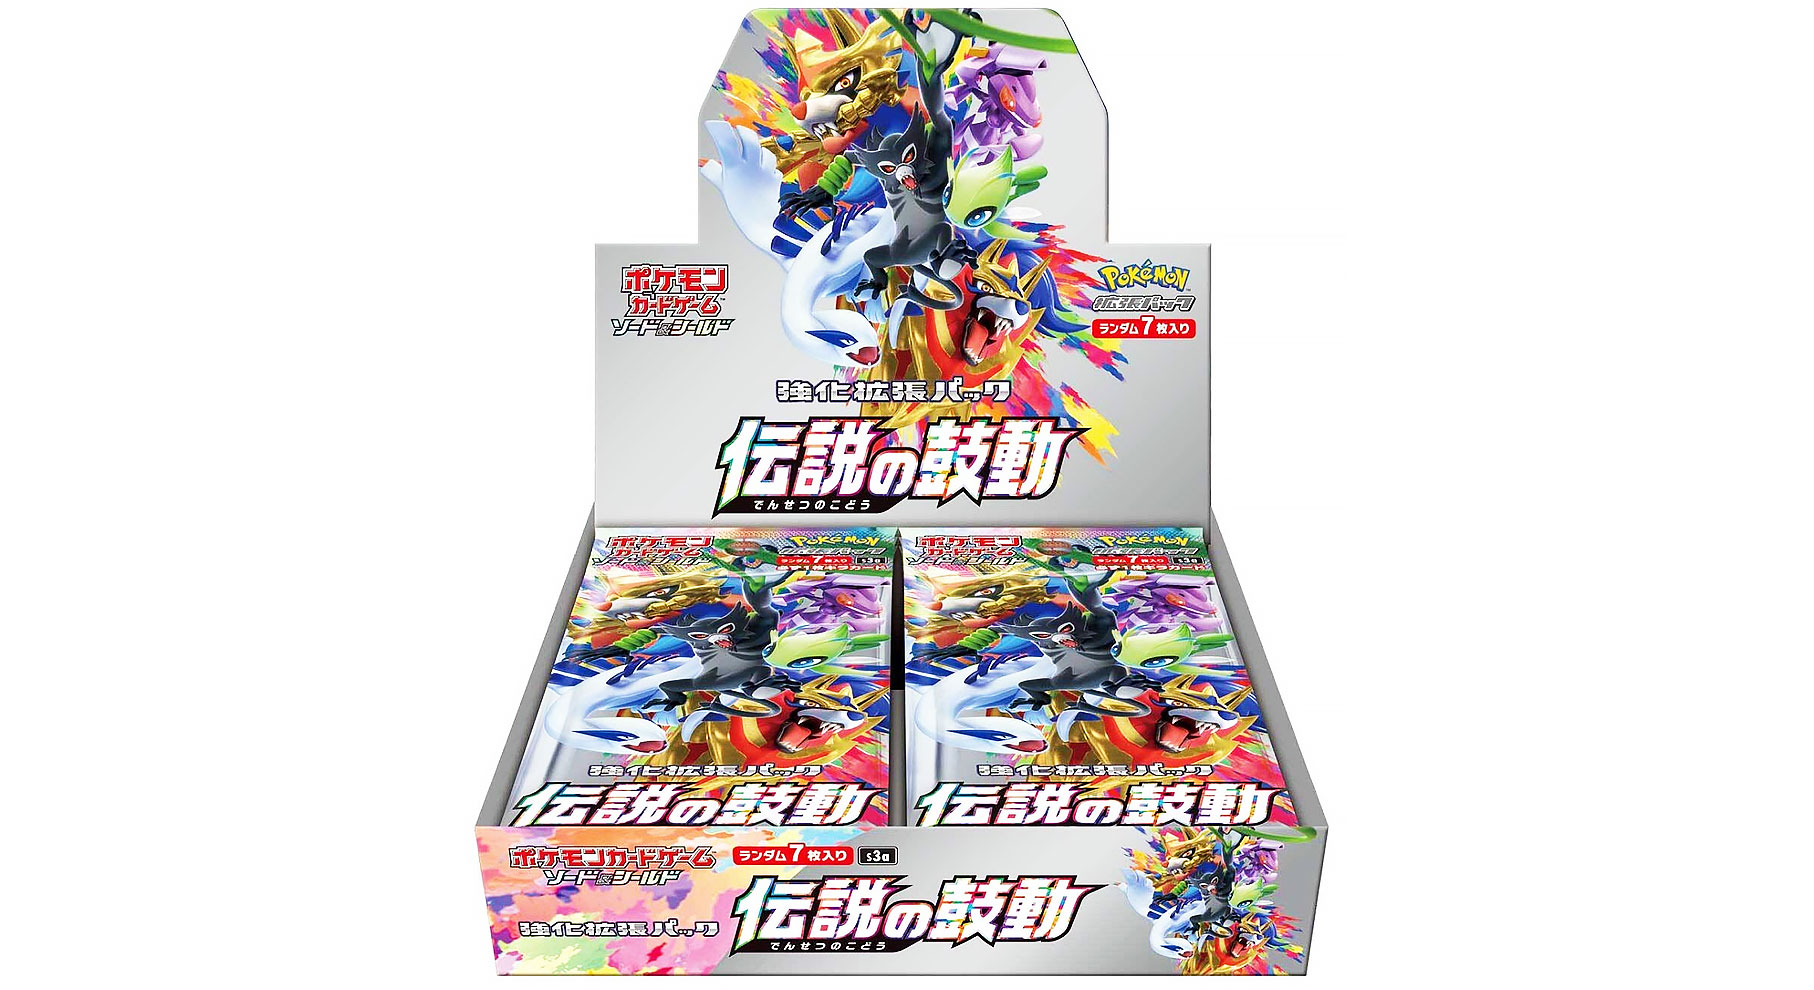 legendary heartbeat set pokemon cards